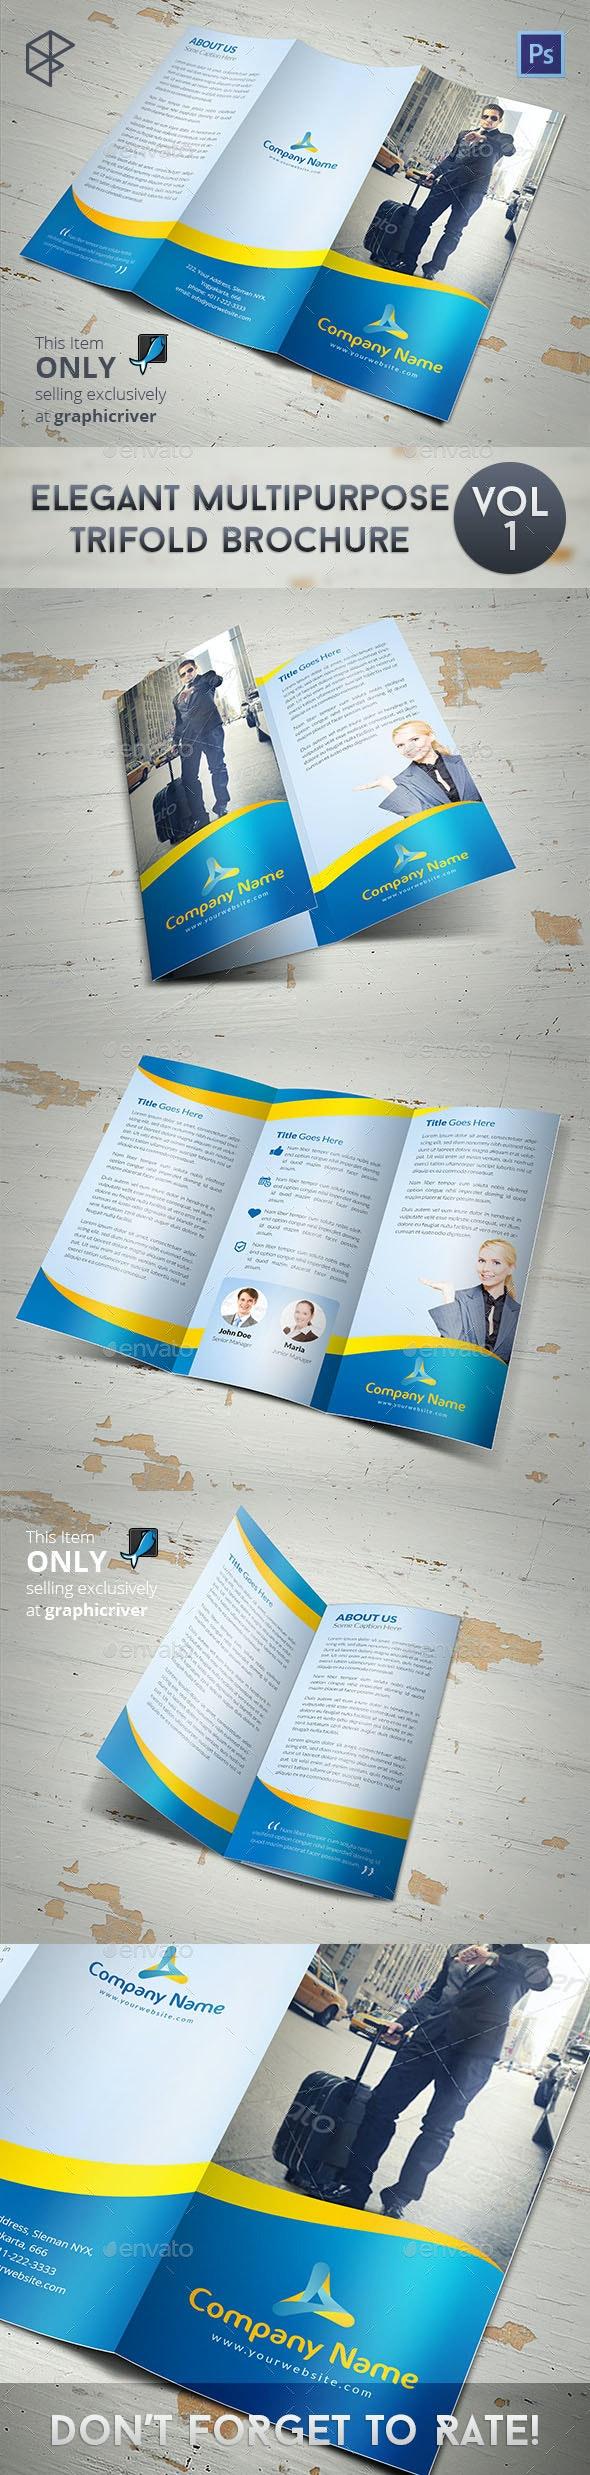 Elegant Multipurpose Trifold Brochure - Corporate Brochures